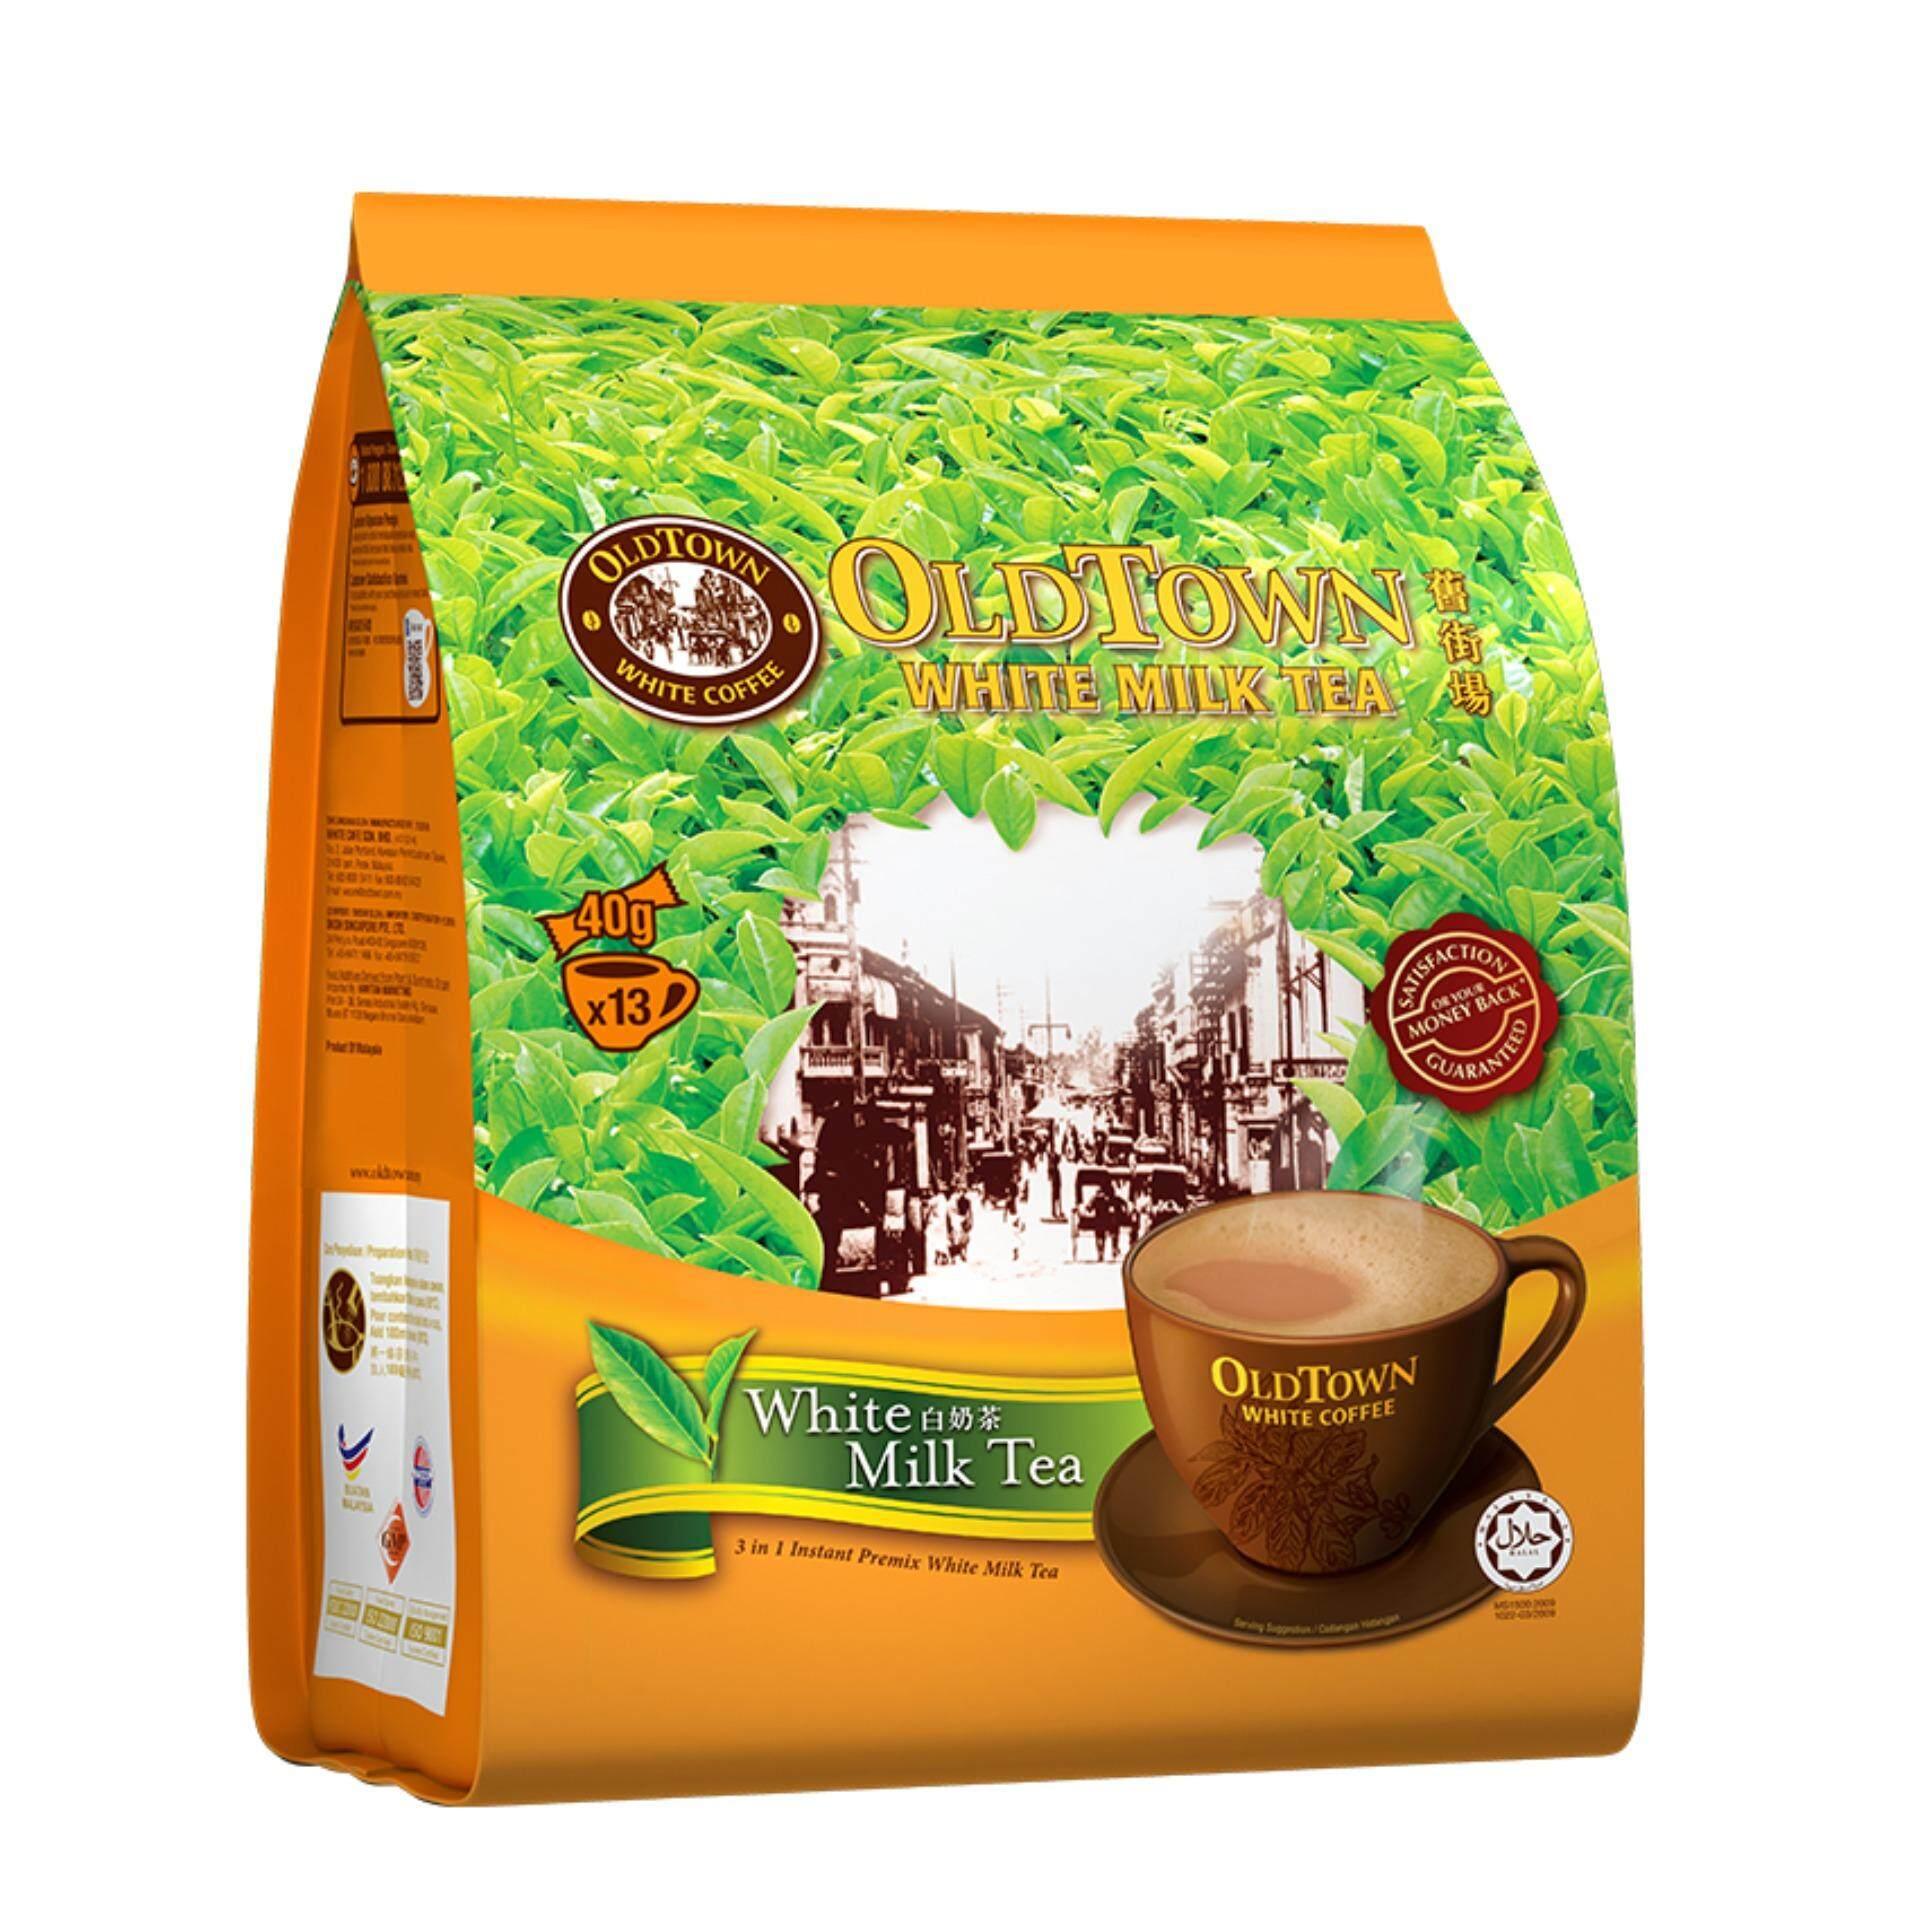 OLDTOWN 3-in-1 Instant Premix White Milk Tea (13S X 1 Pack)